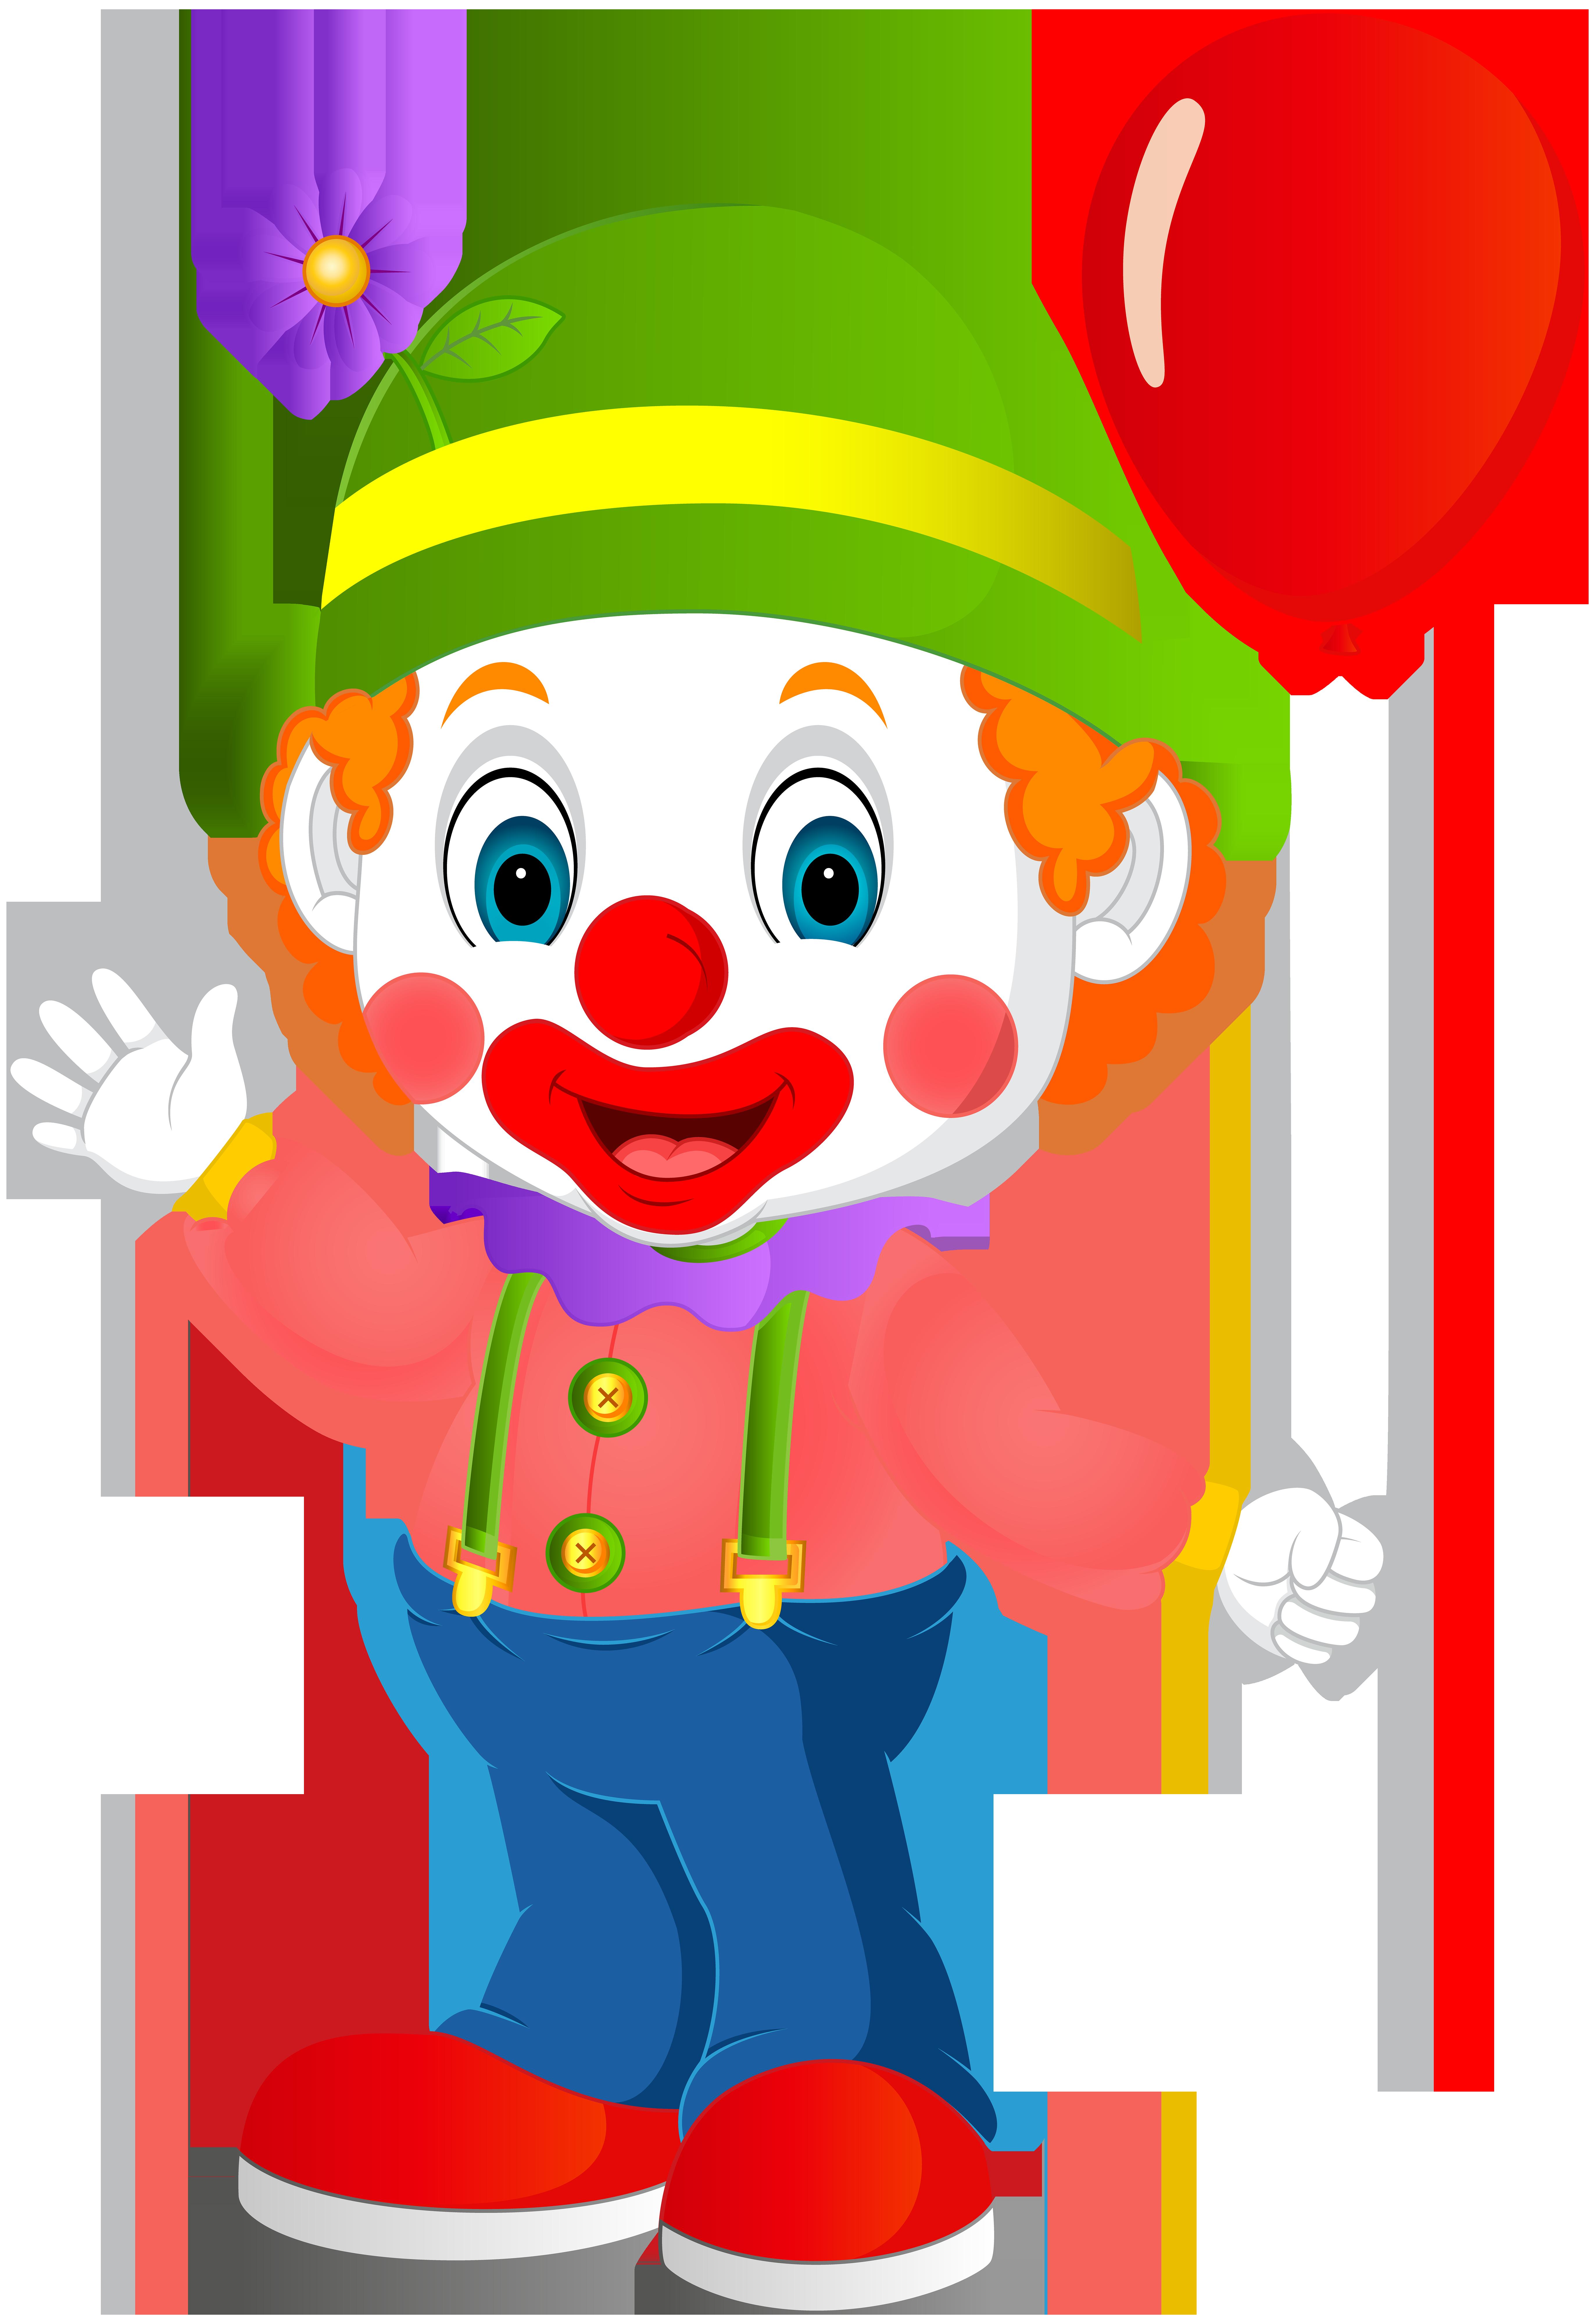 image Cute clown transparent png. Grades clipart intellegent